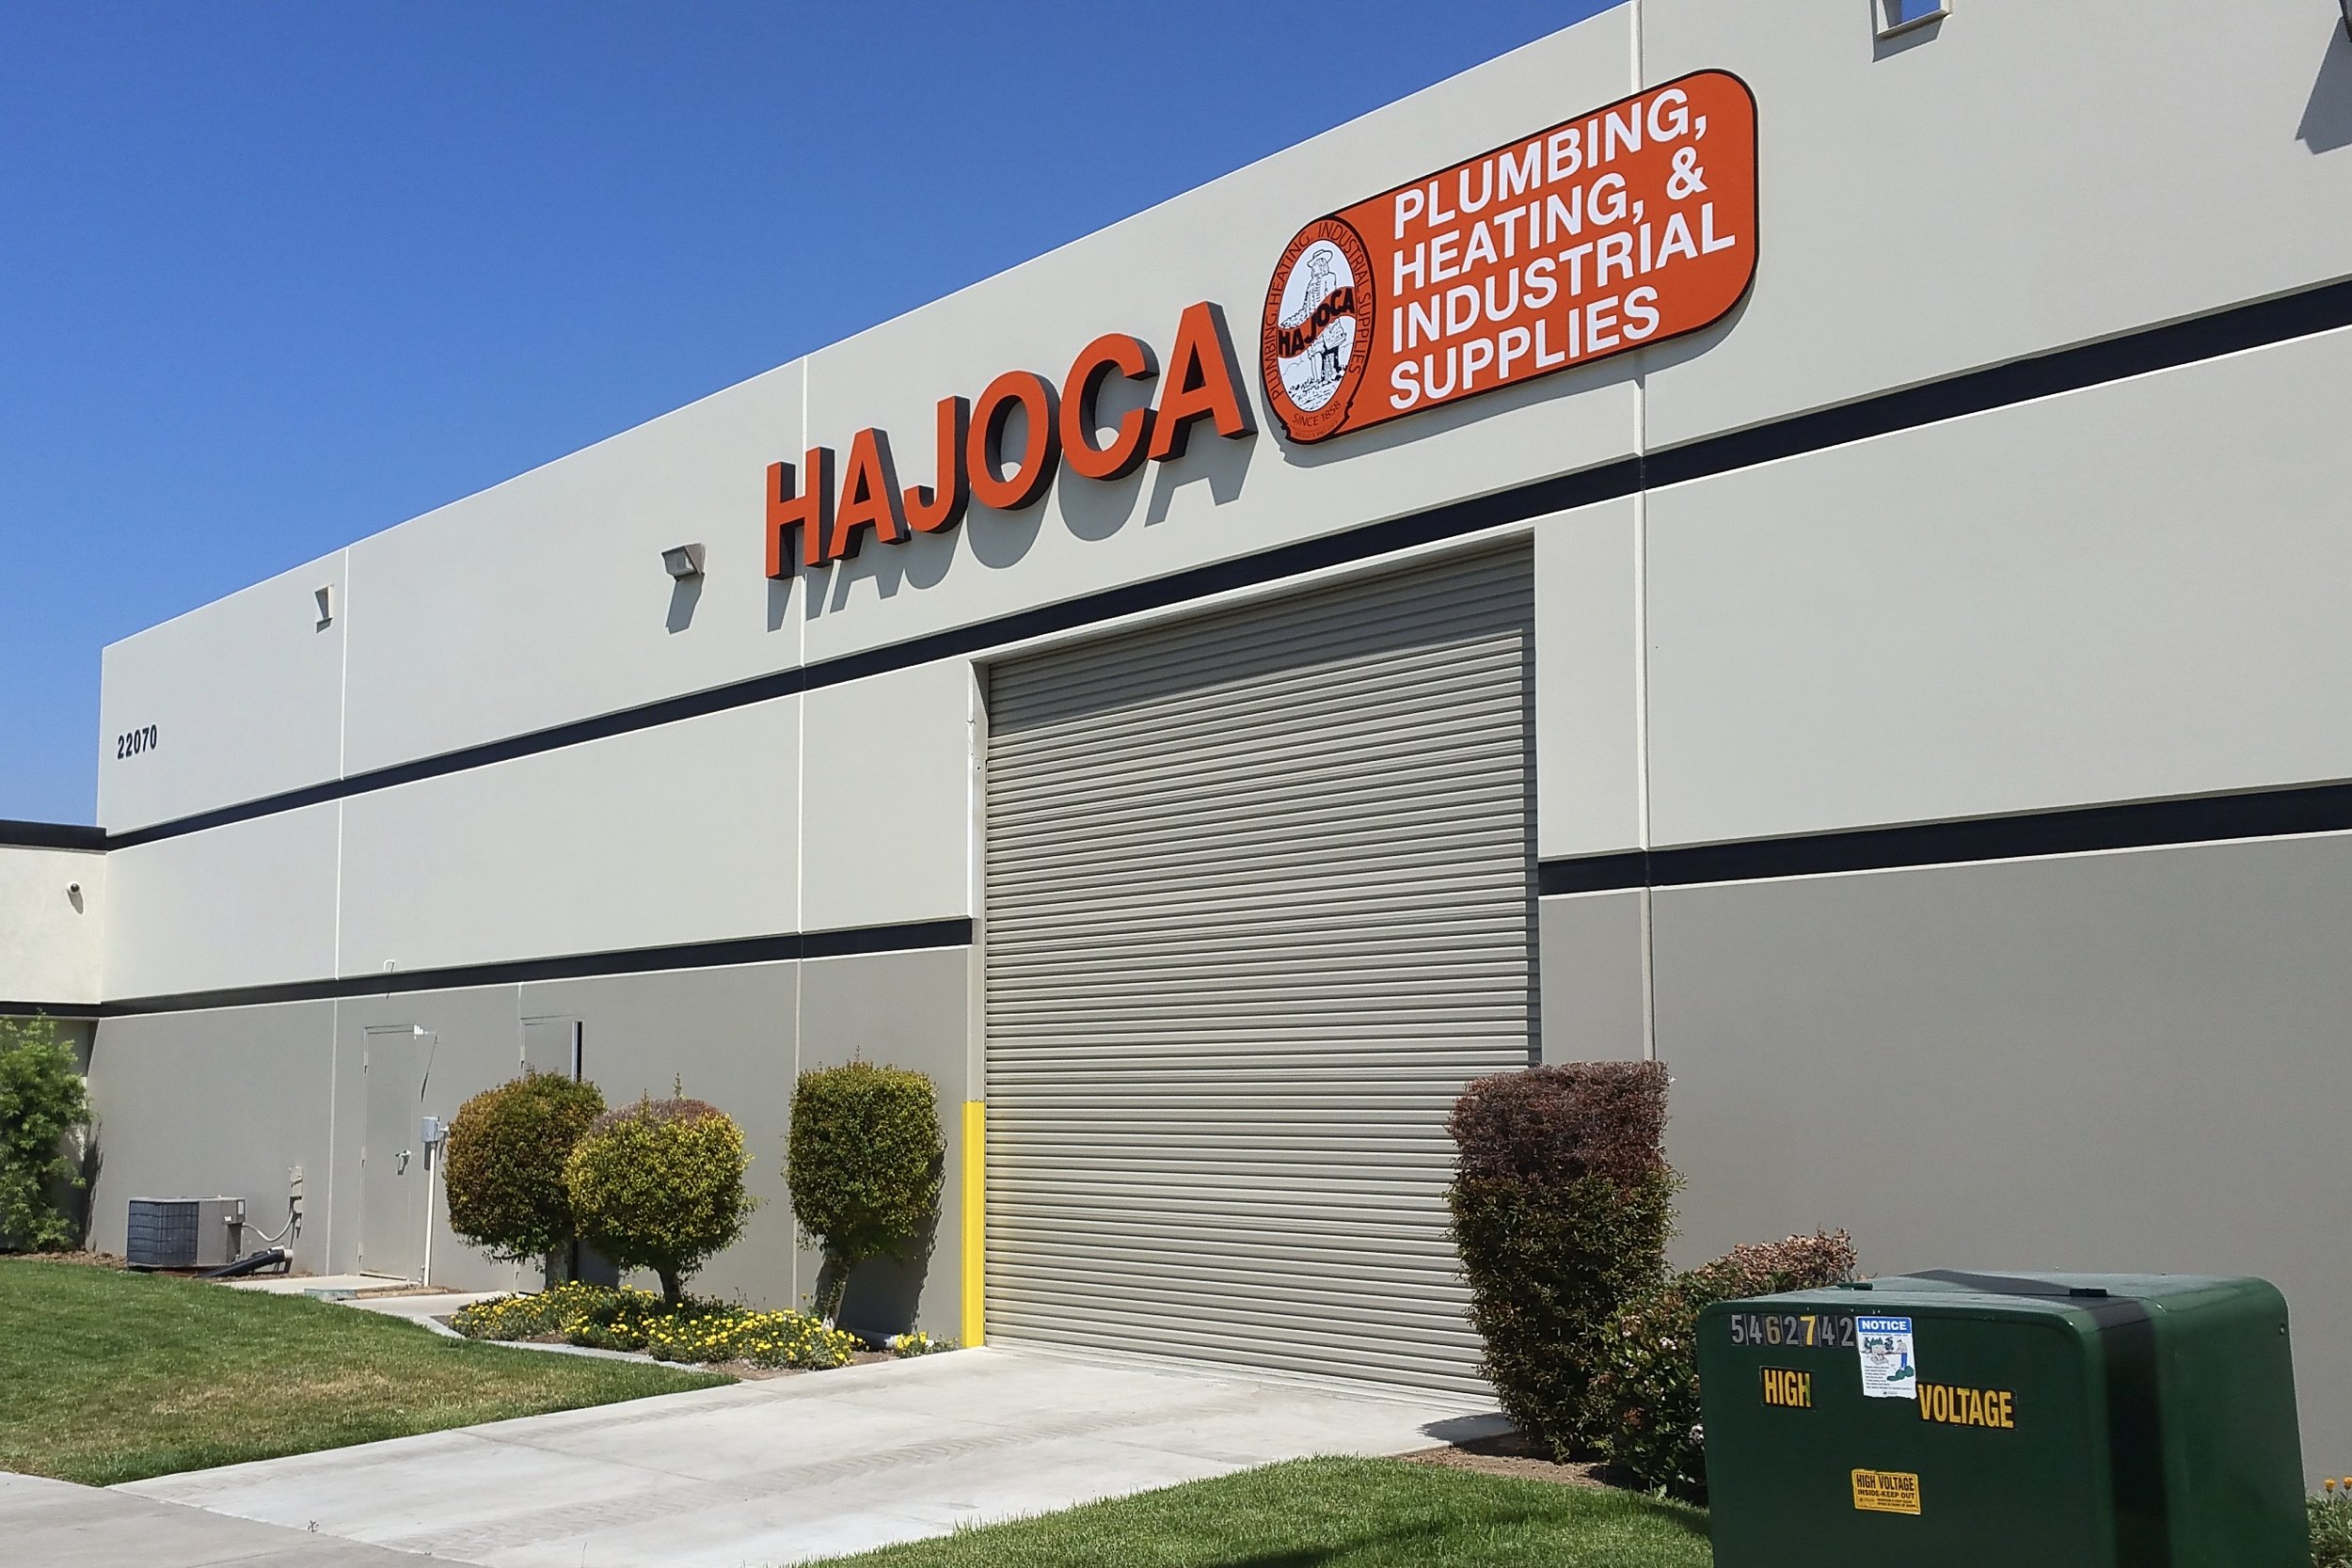 Hajoca Plumbing Supply dimensional letter sign